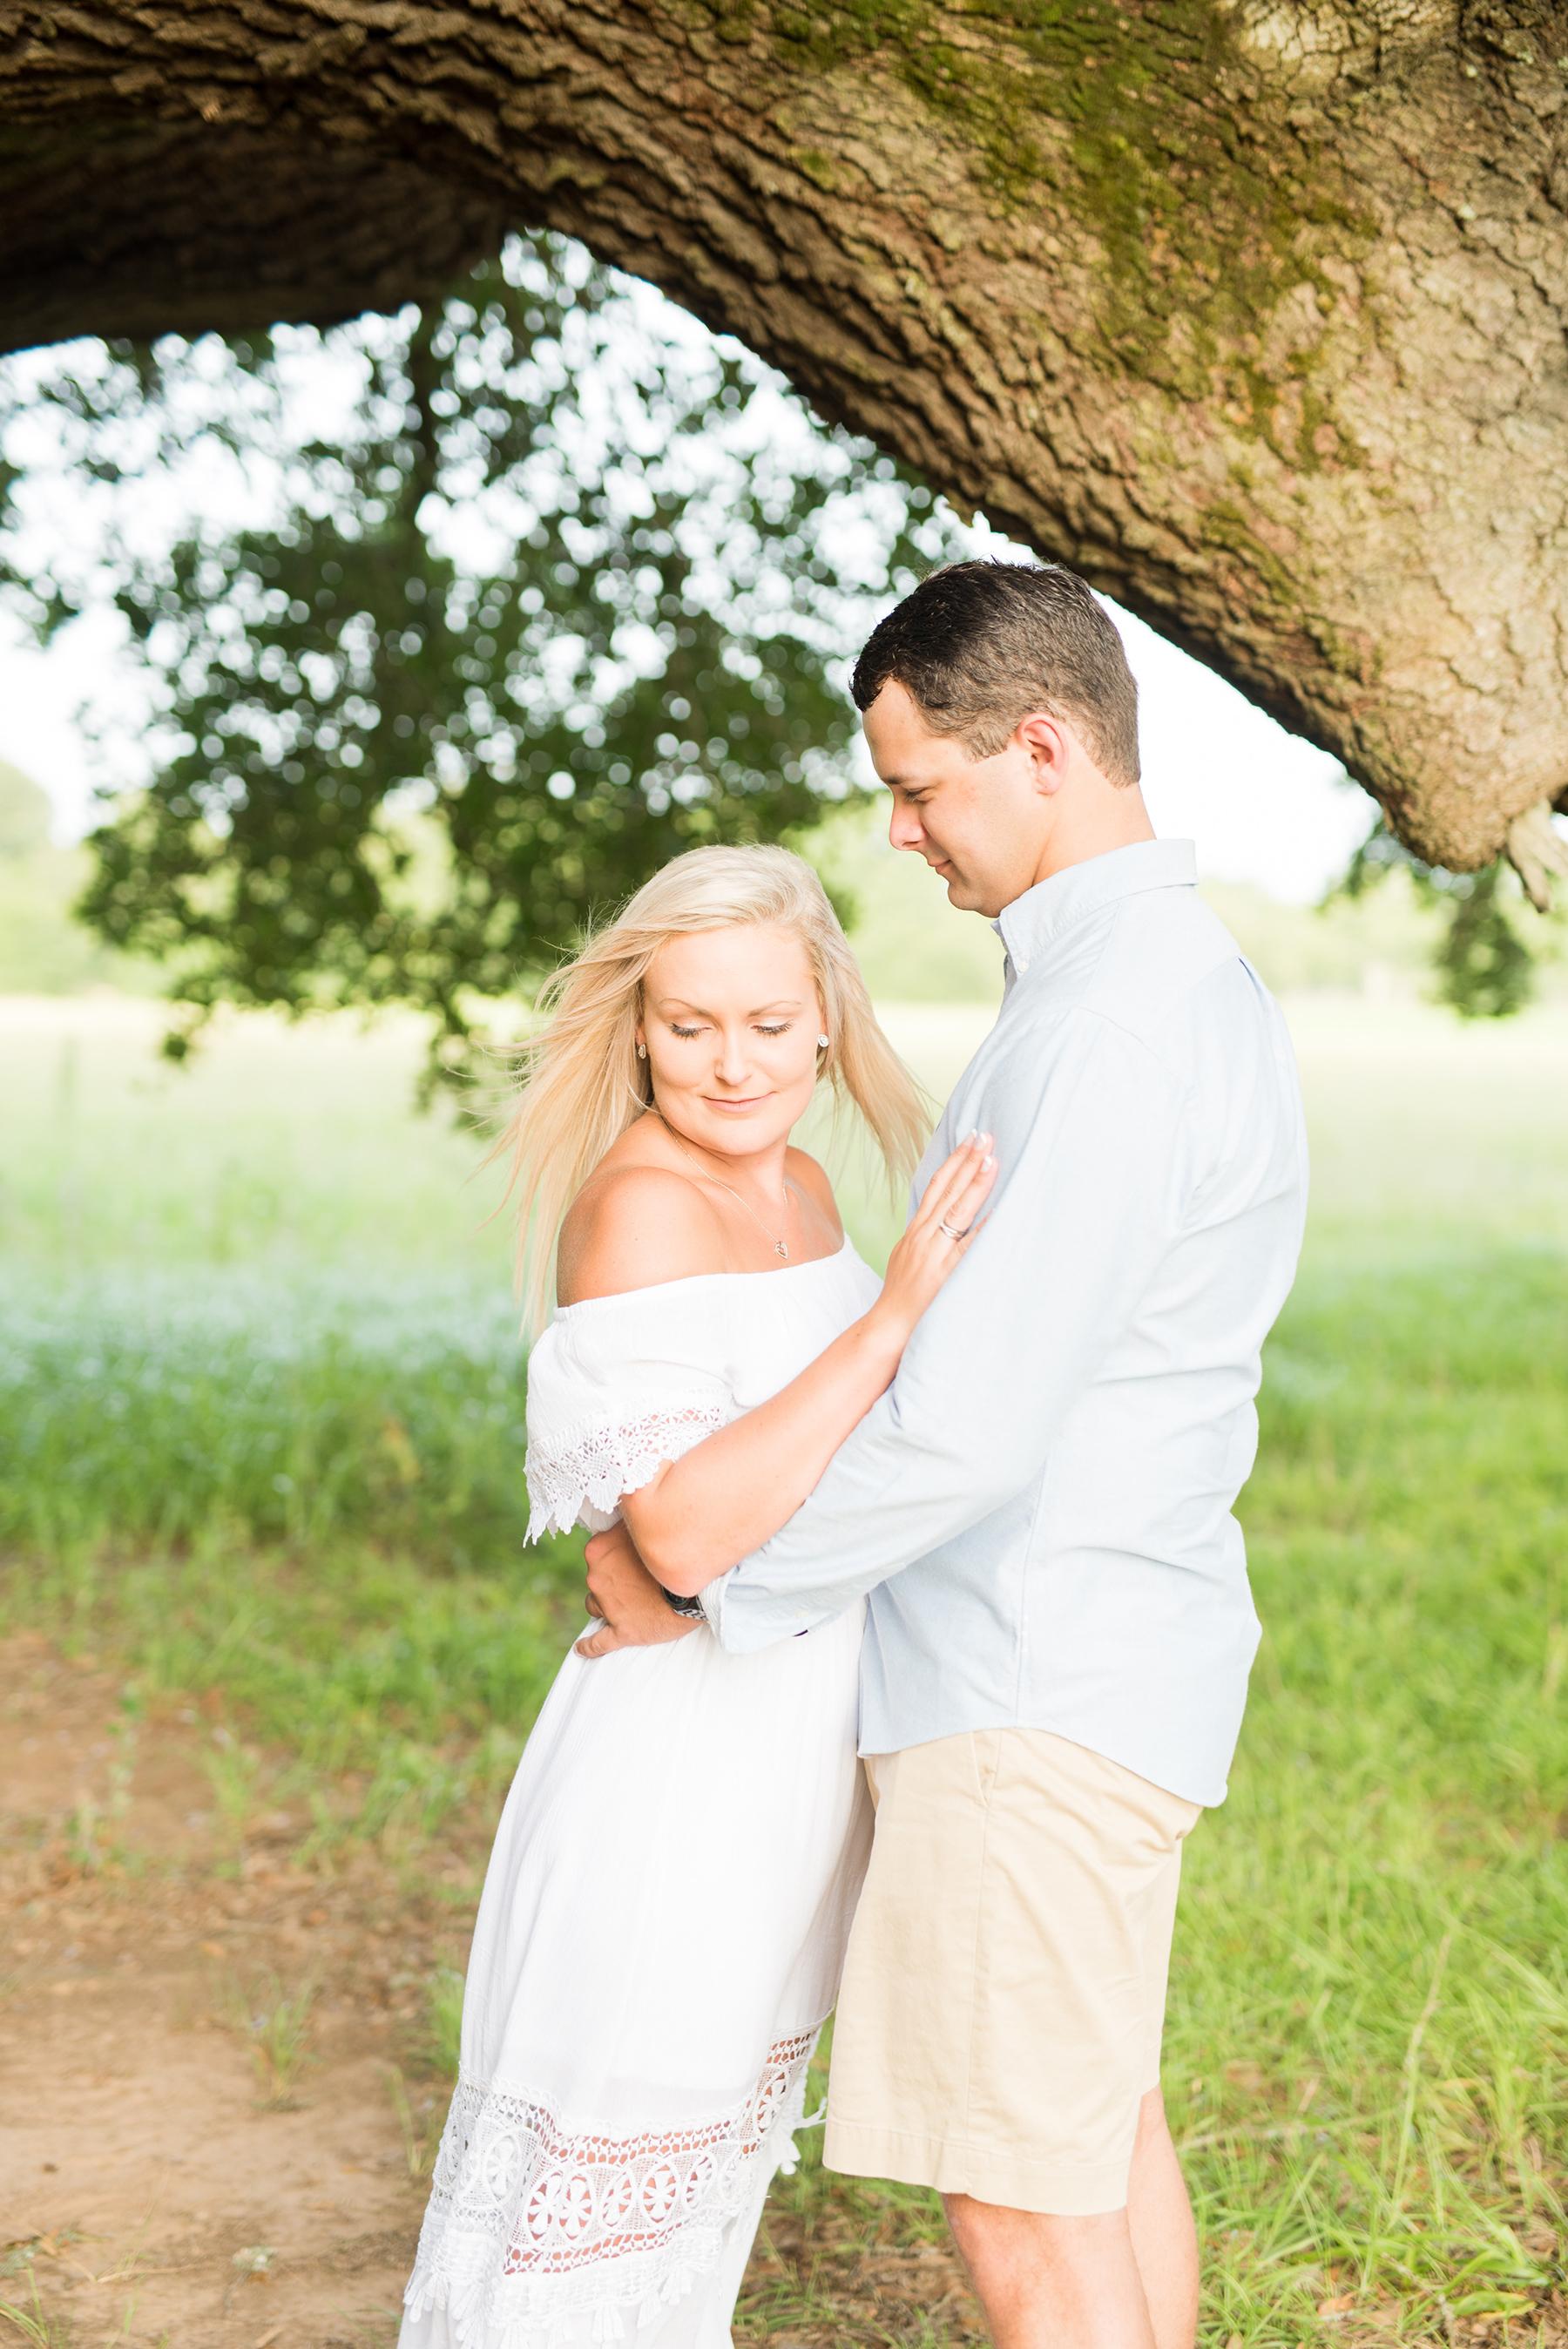 Leighton + Landon's Engagement Portraits